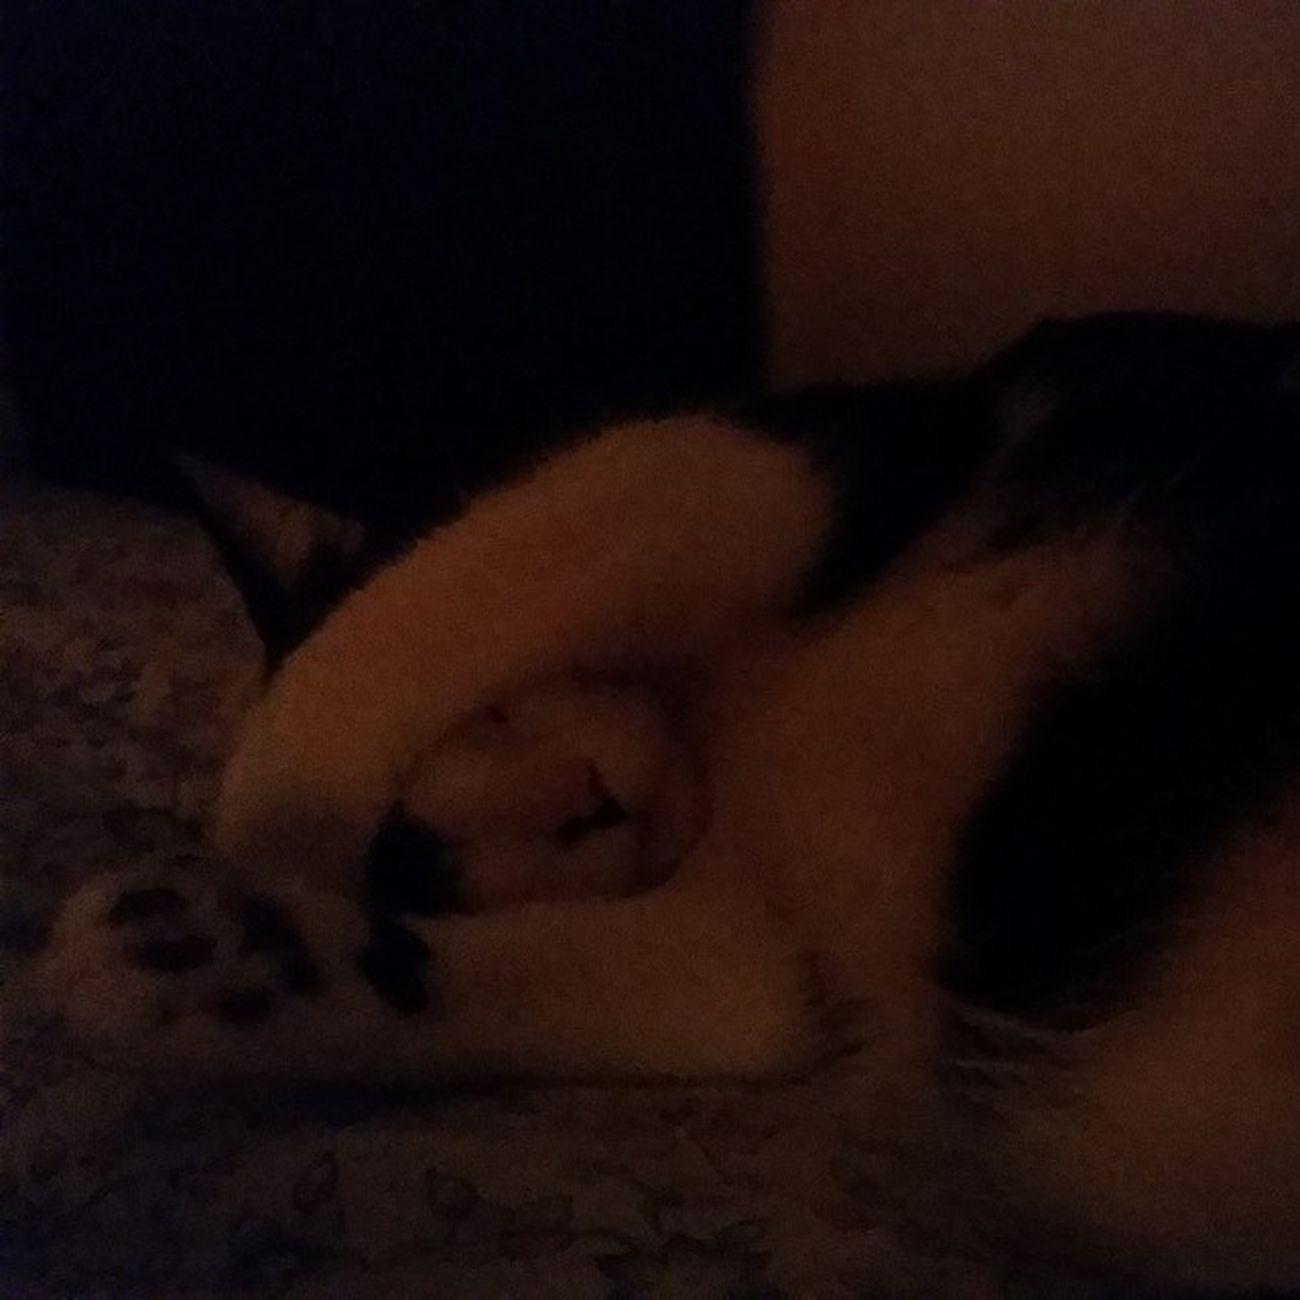 Good night from Ming Ming ??? Themingming Blackandwhitecats Familiar Lazycatdaze sleepybaby bedofcats catsofinstagram cats catscatscats fiercefelines